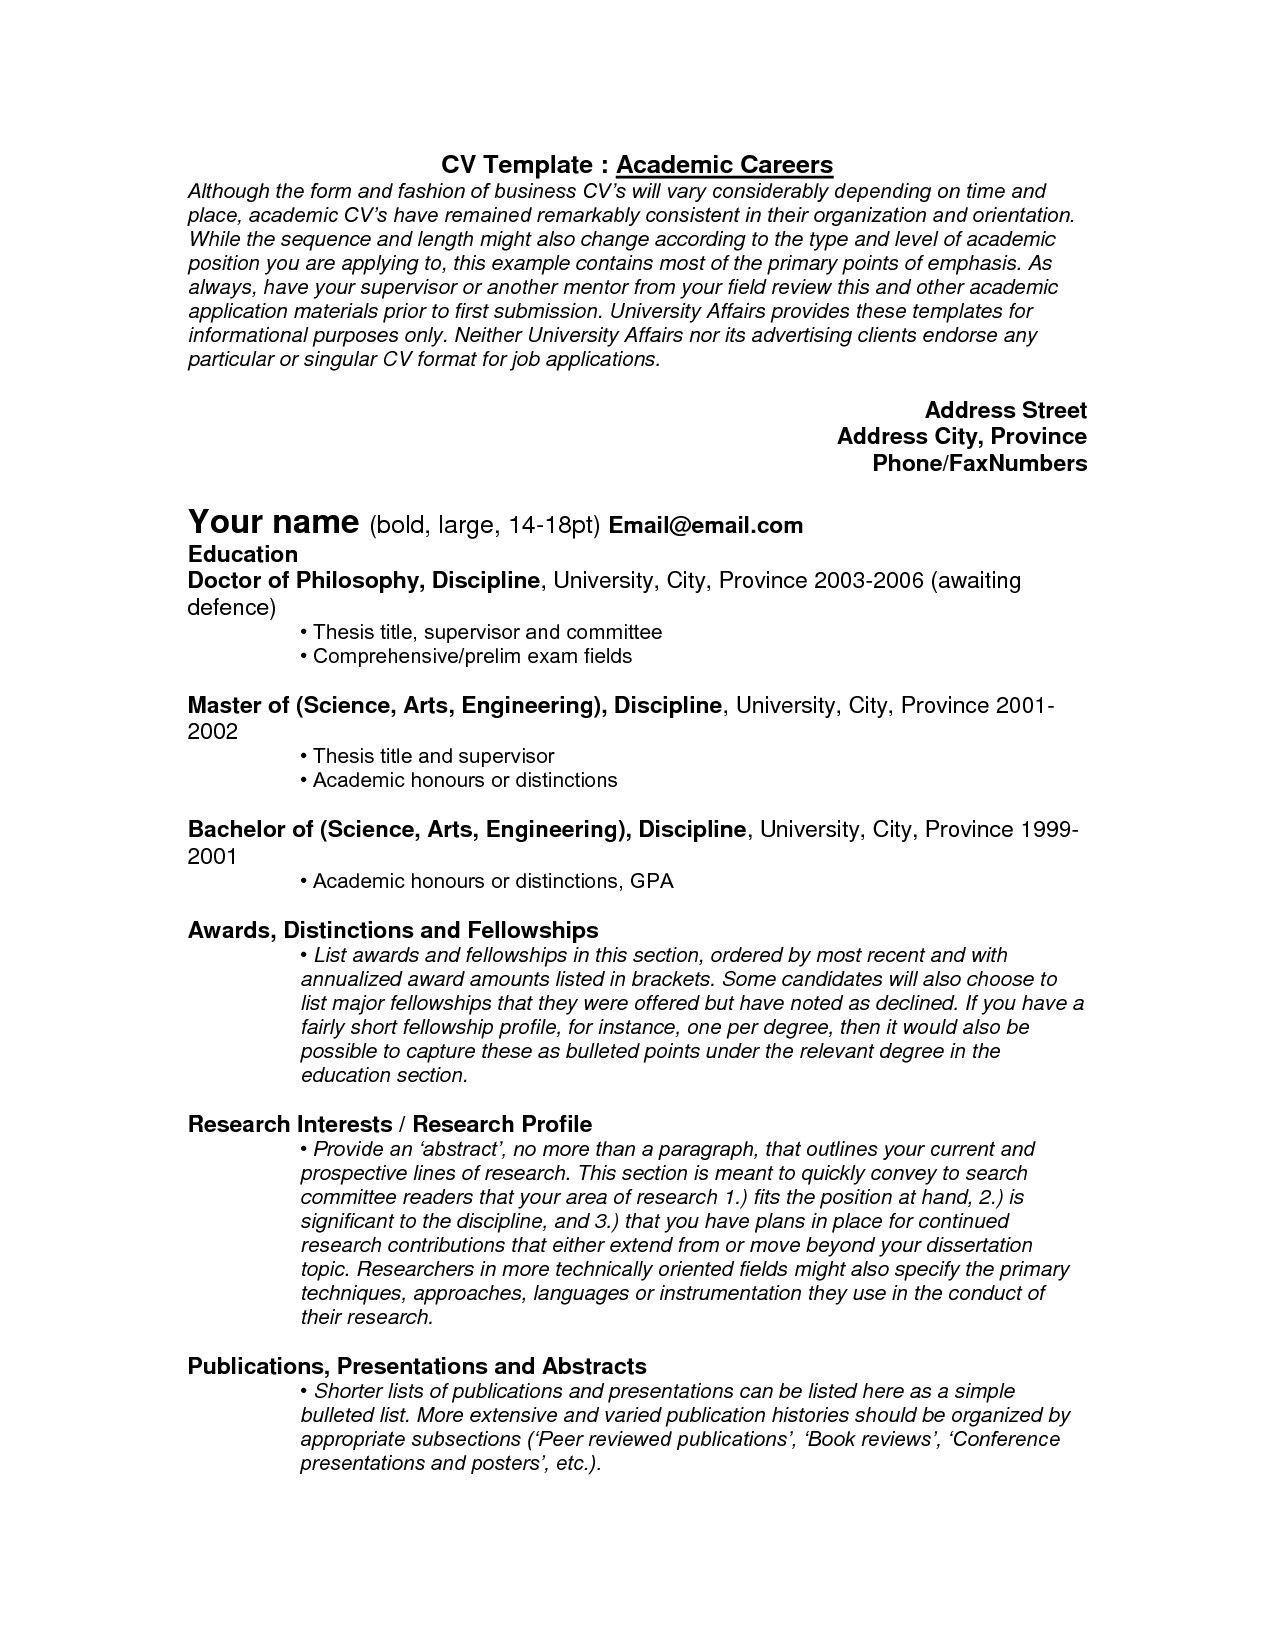 Resume Templates Uoft Resume Resumetemplates Templates Cover Letter For Resume Resume Examples Resume